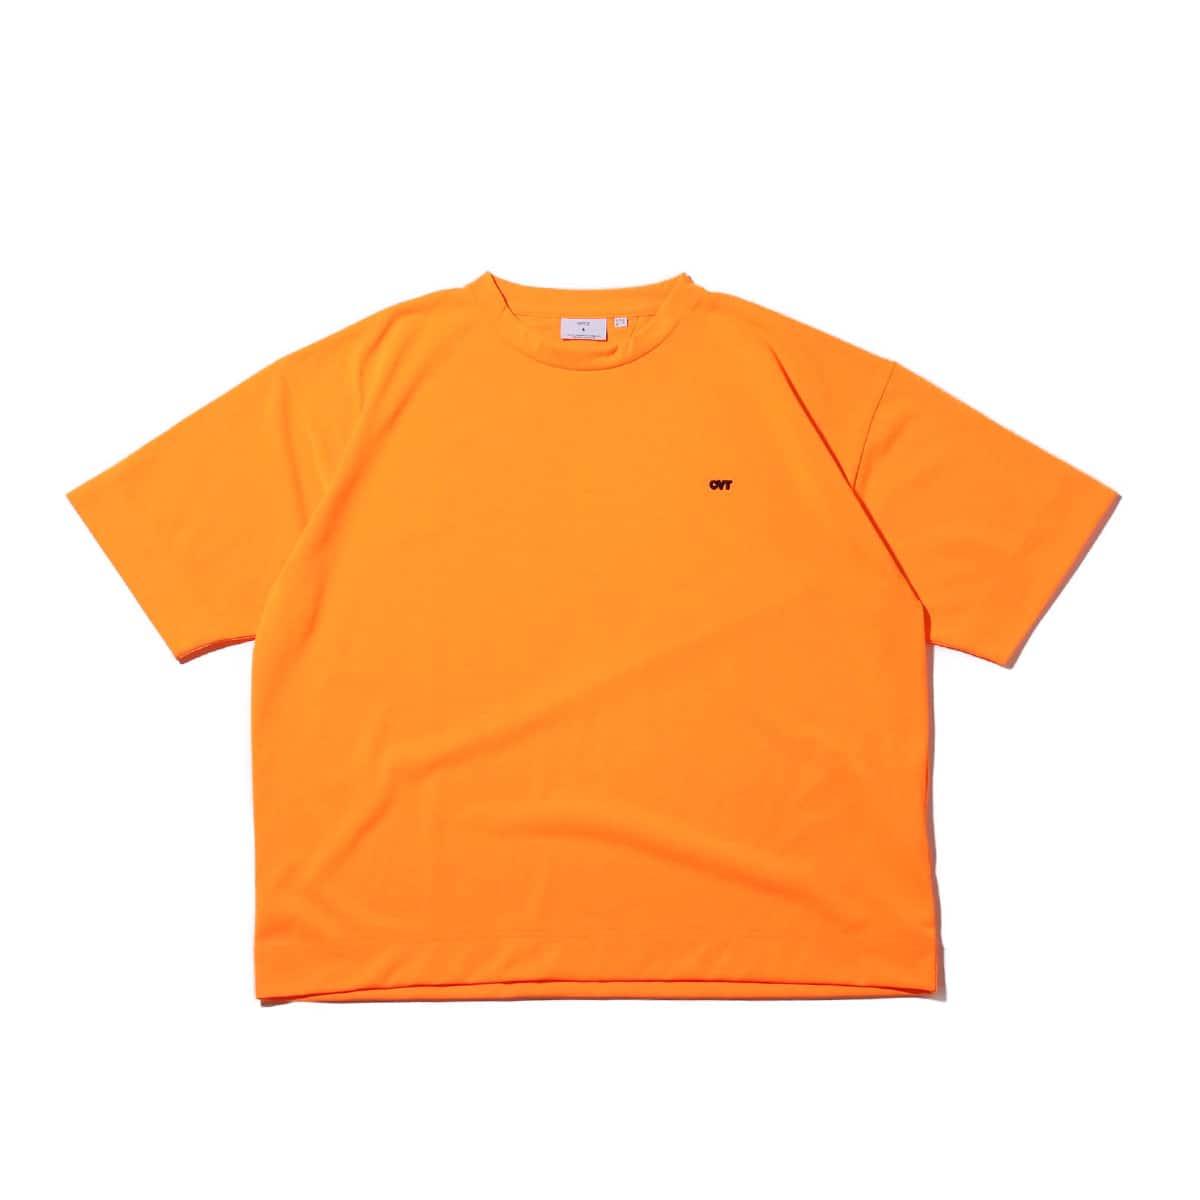 CONVERSE TOKYO ワンポイント 刺繍 Tシャツ オレンジ 19SS-I_photo_large